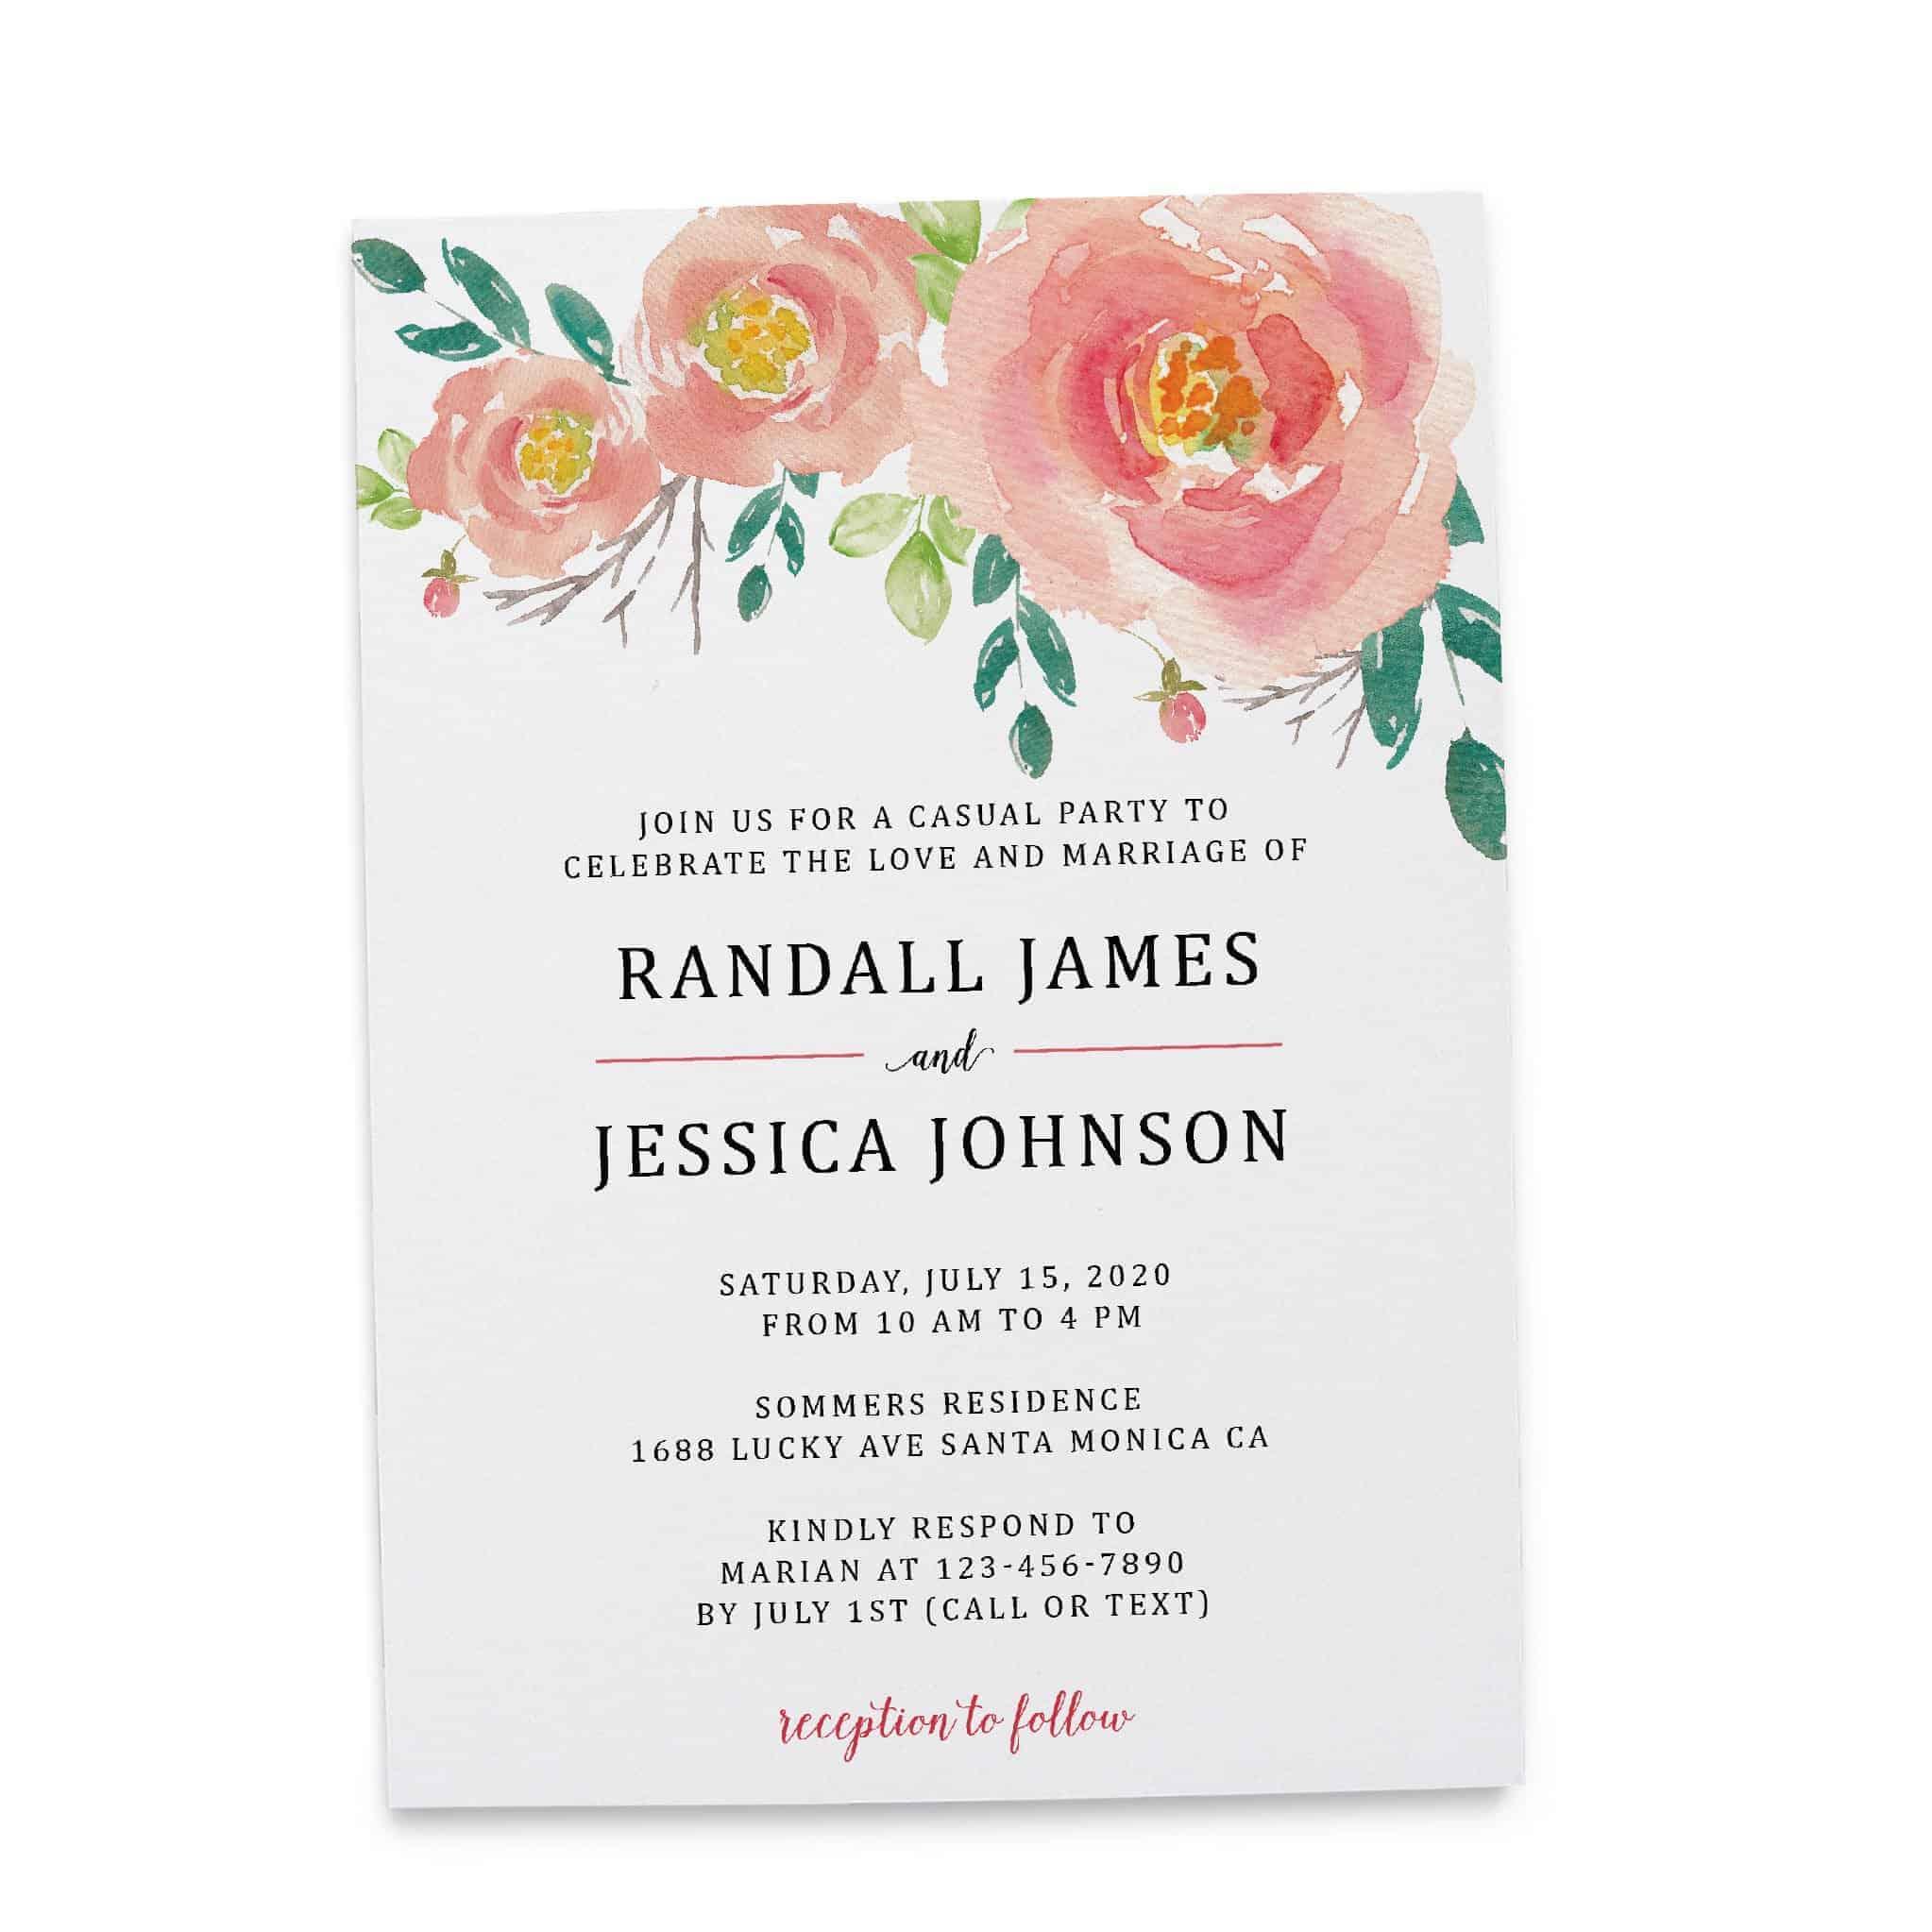 Bespoke Reception Invitation Cards, Pretty Floral Wedding  Party Invitations, Wedding Party Flat Card, Affordable Luxury